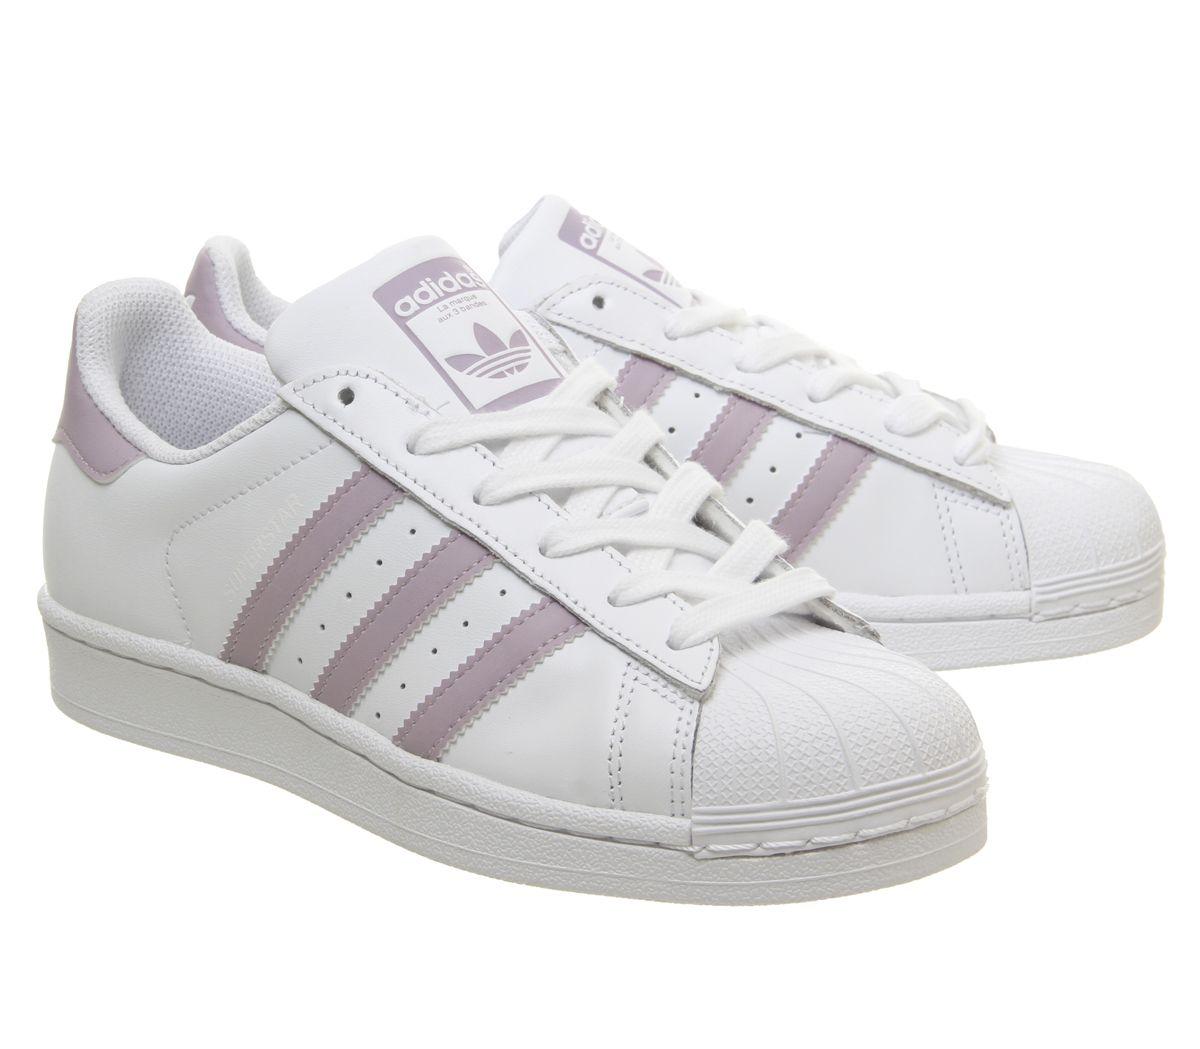 new arrival 9e669 7a8d9 SENTINEL Donna Adidas Superstar 1 formatori visione morbida nera scarpe da  ginnastica scarpe bianco